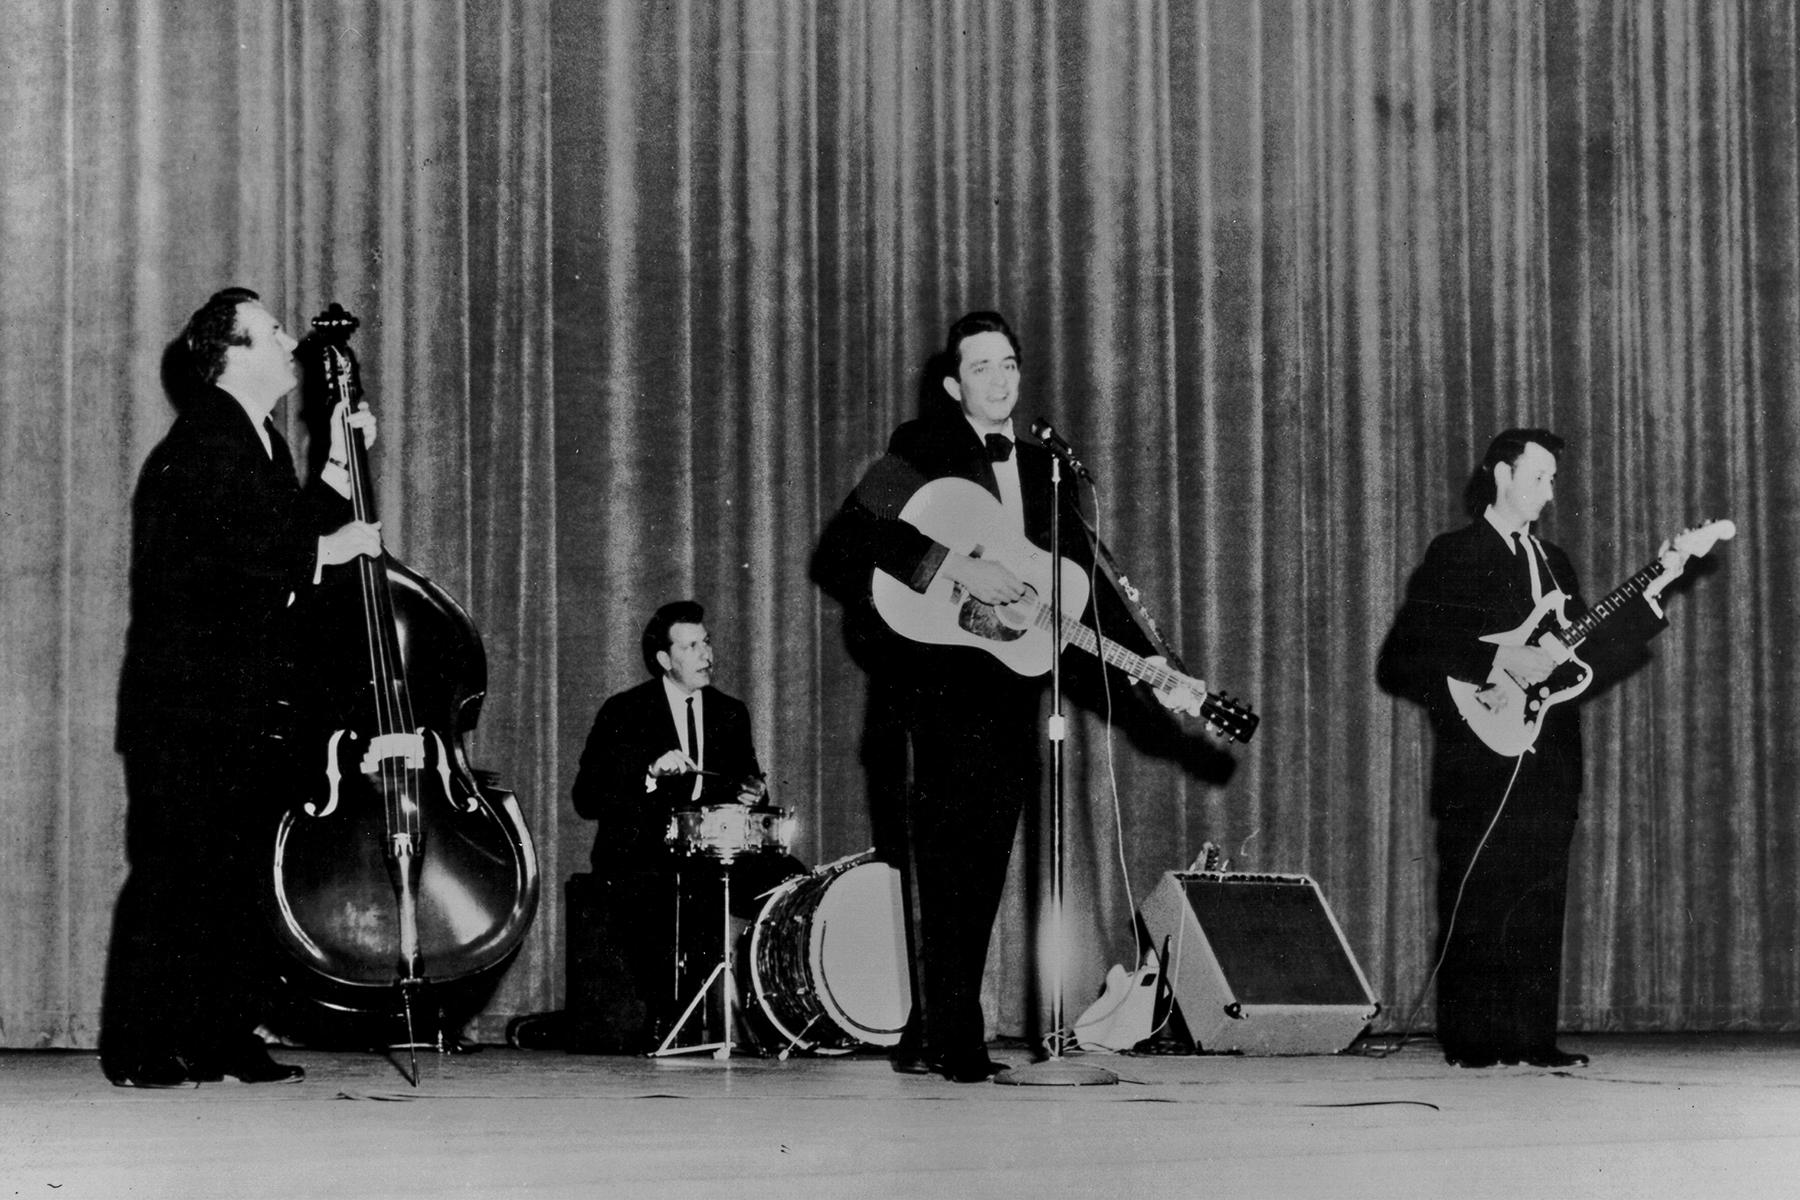 W.S. 'Fluke' Holland, Johnny Cash Drummer, Dead at 85 - Rolling Stone